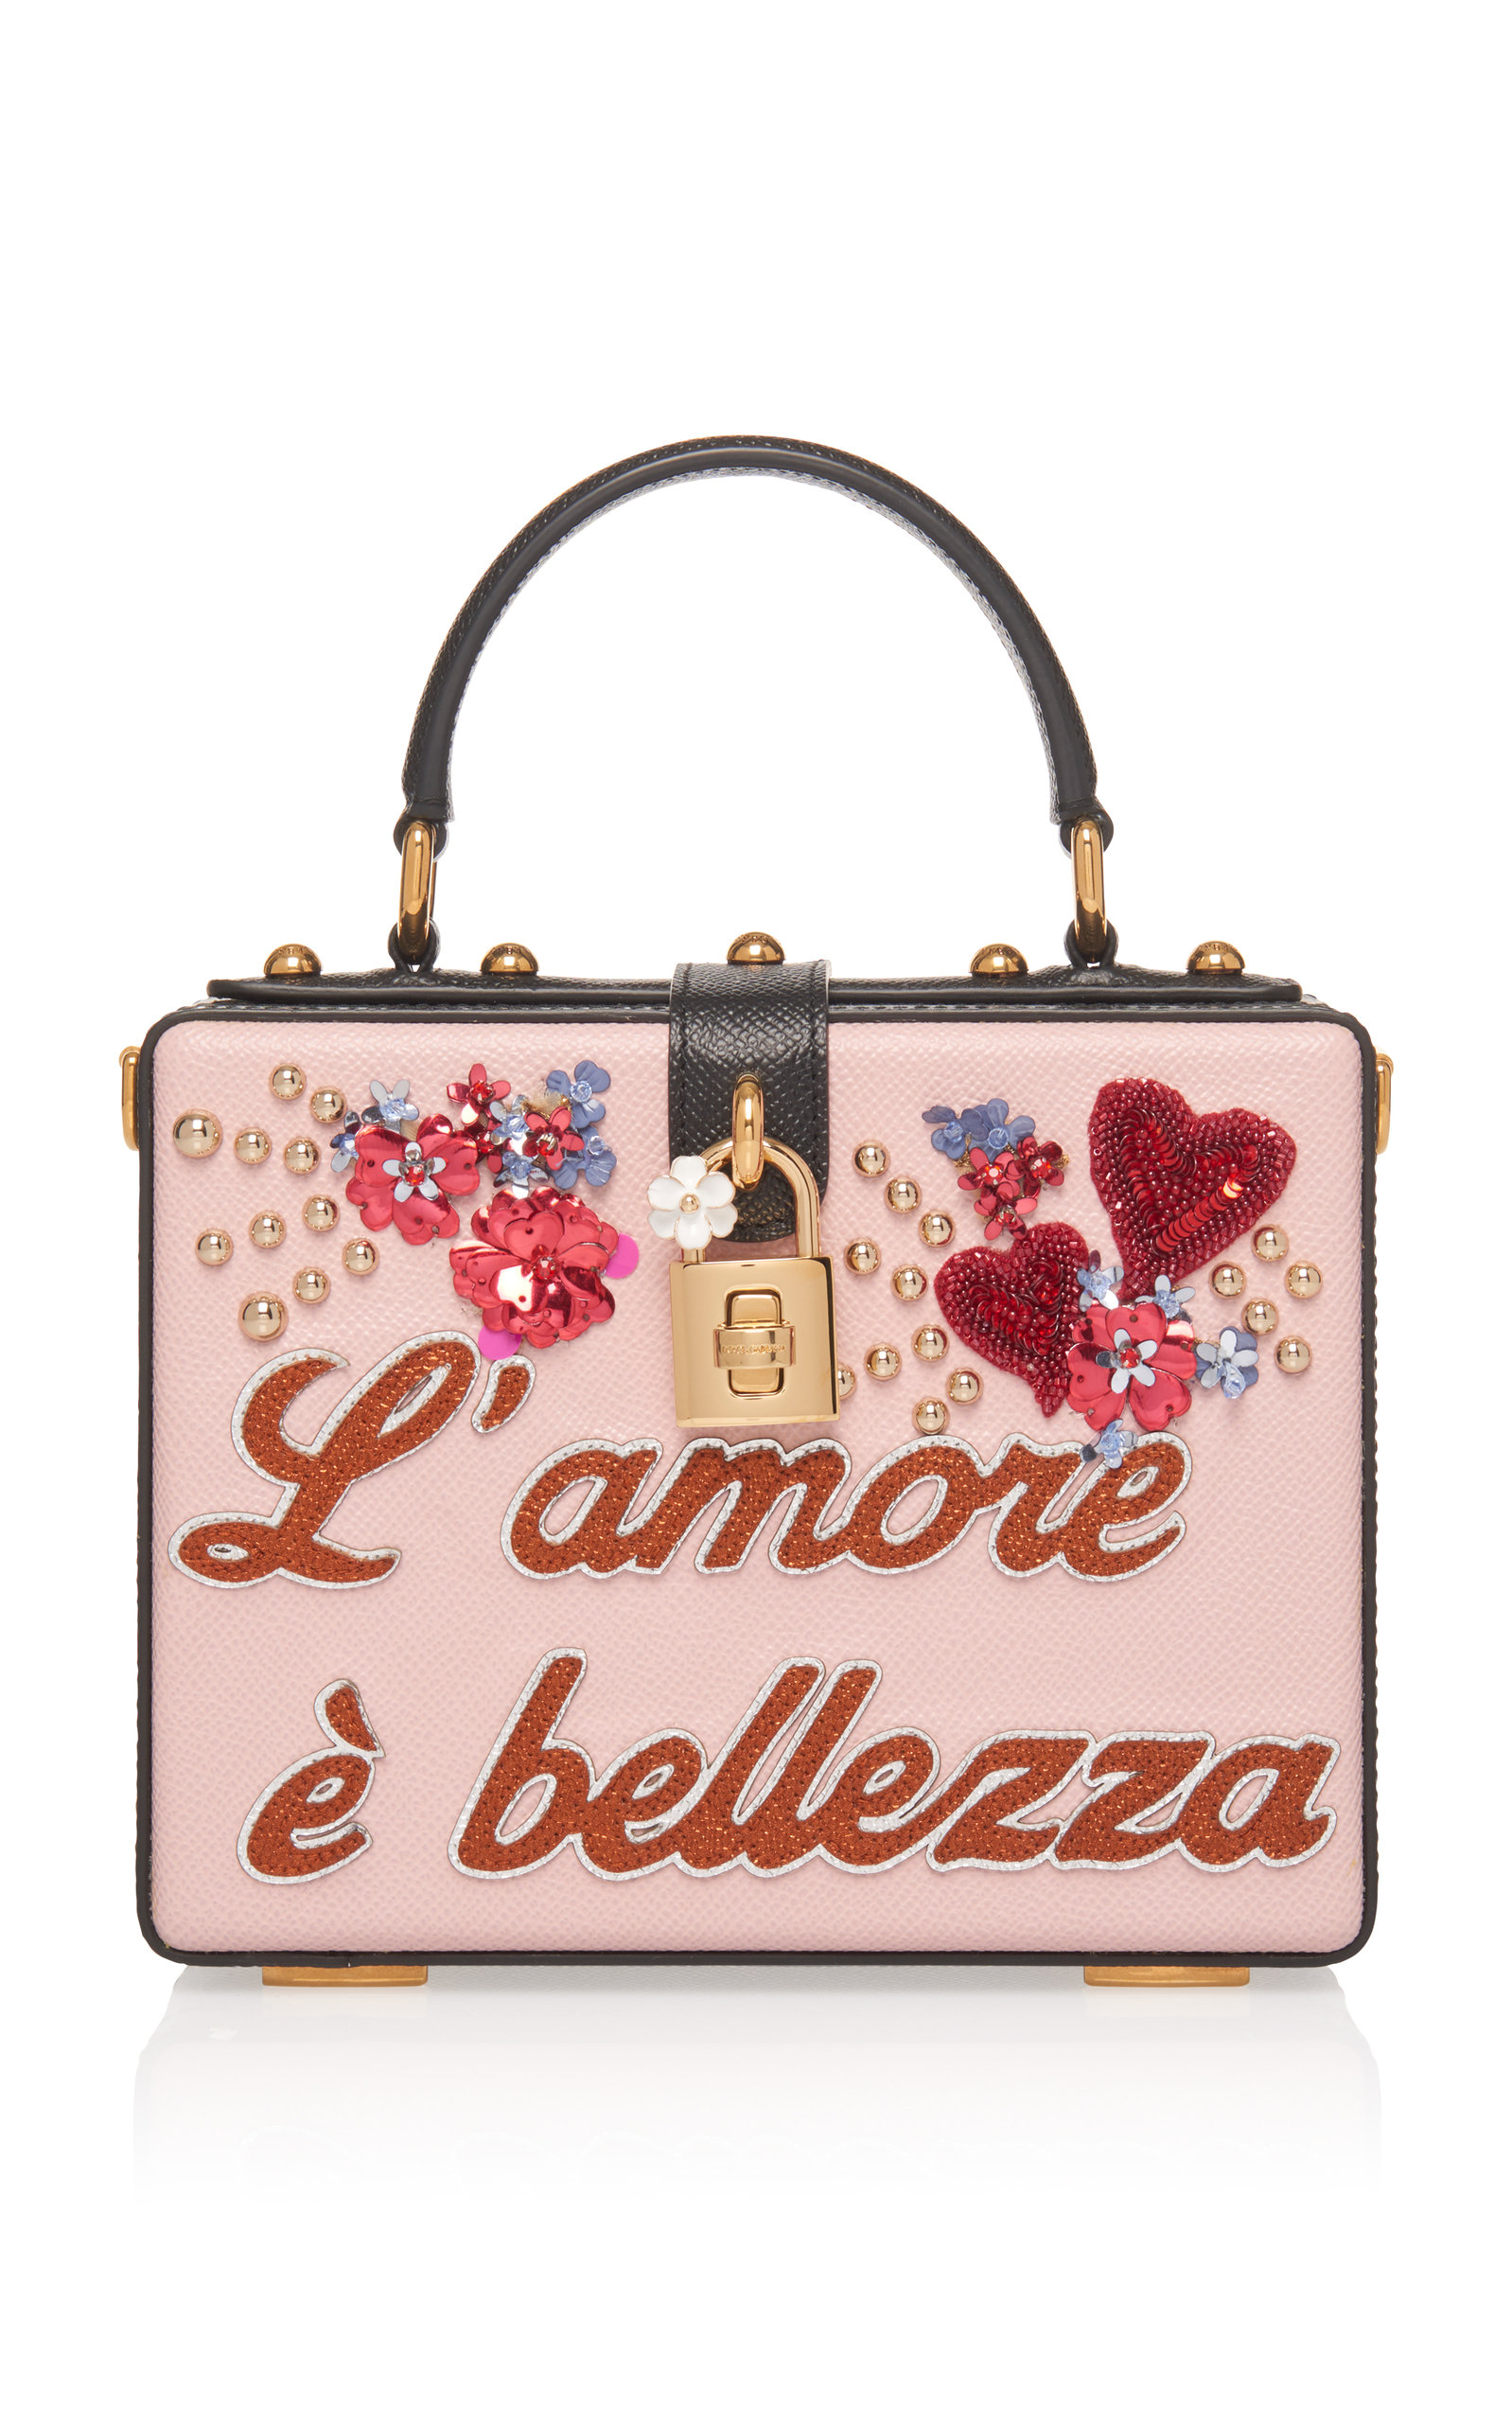 38d3024e1b Dolce   Gabbana Embellished Leather Box Tote